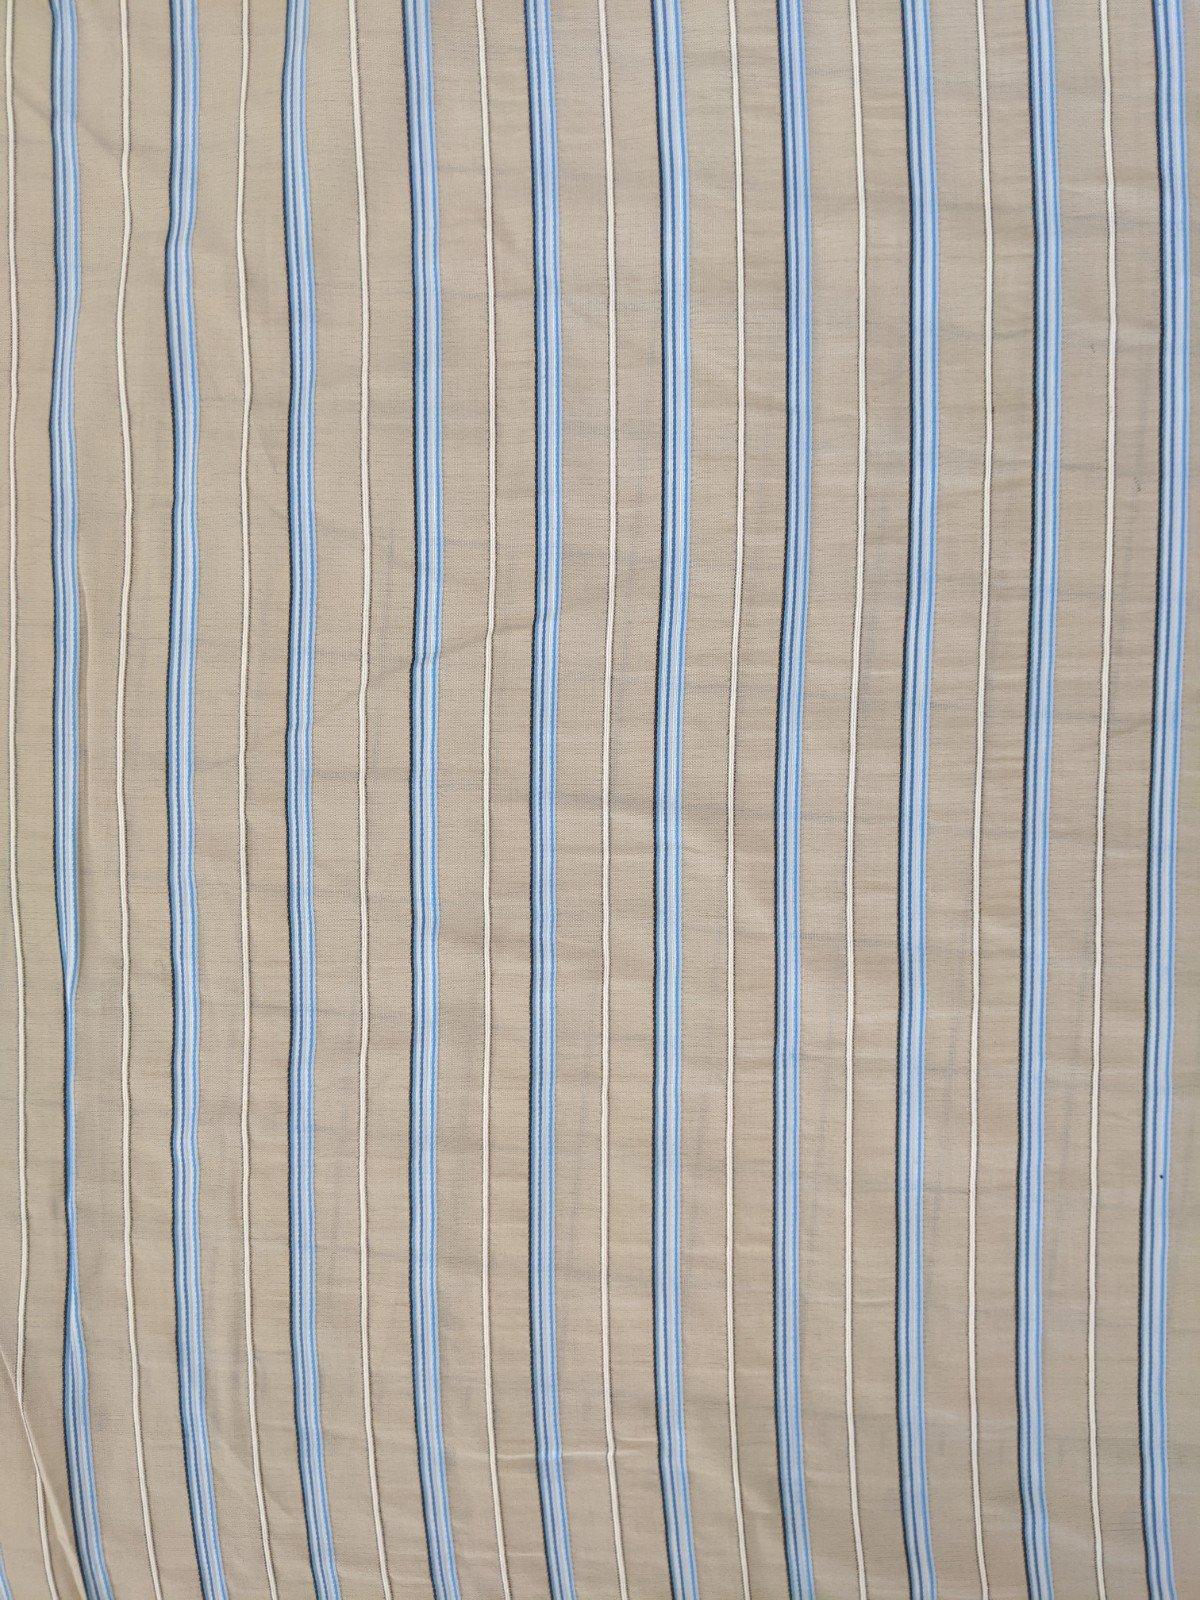 Italian Shirting - Beige/White/Blue Stripe